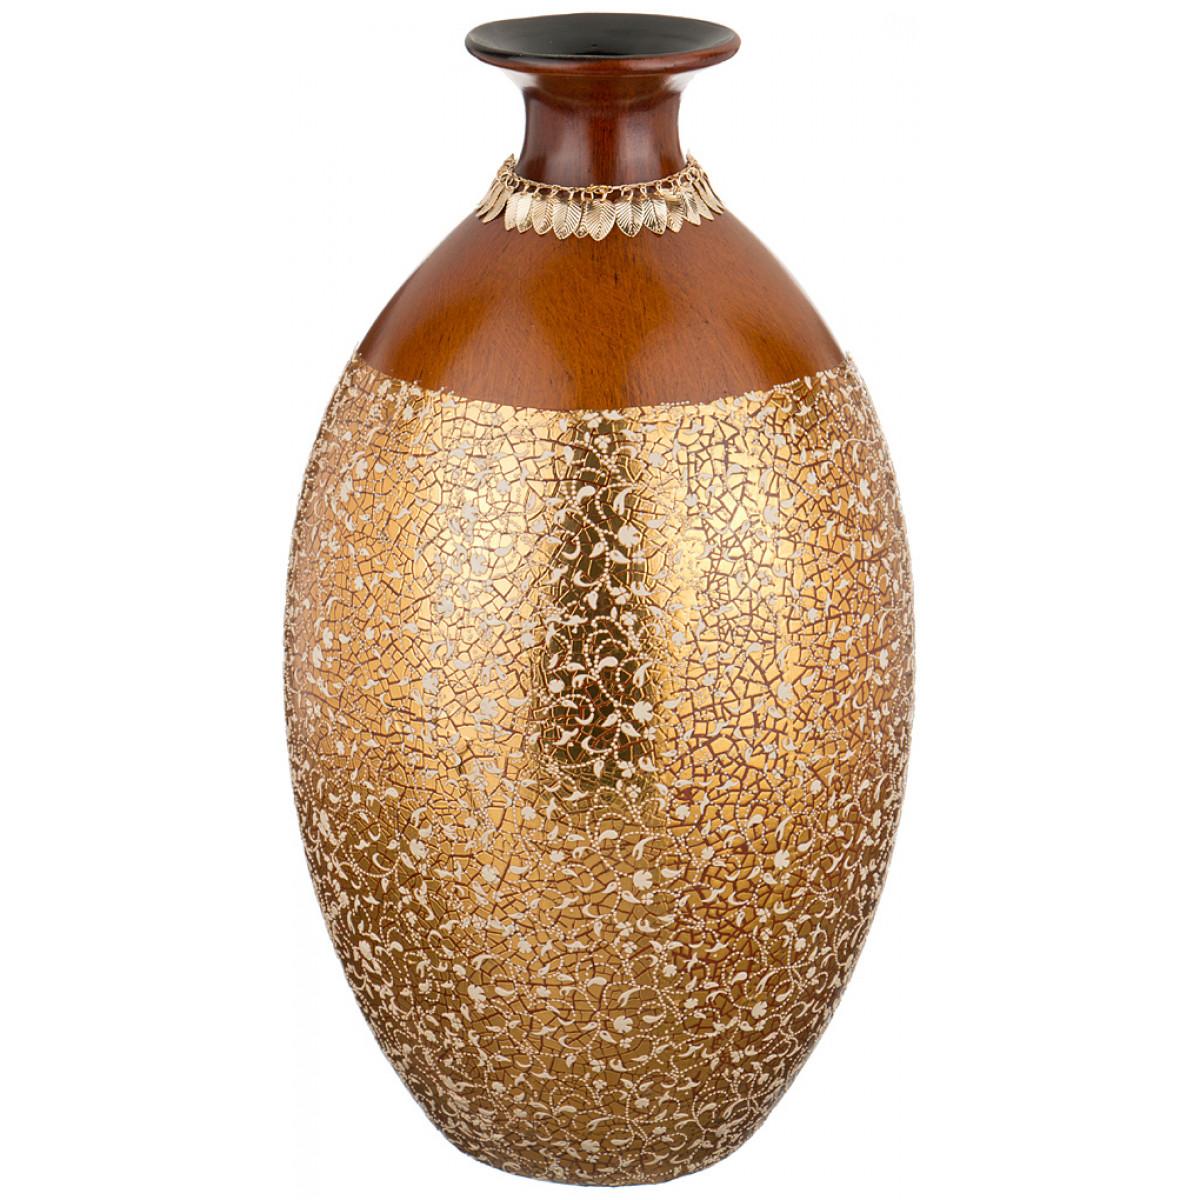 Вазы Lefard Ваза Corliss (23х42 см) lefard ваза adria 27х30 см